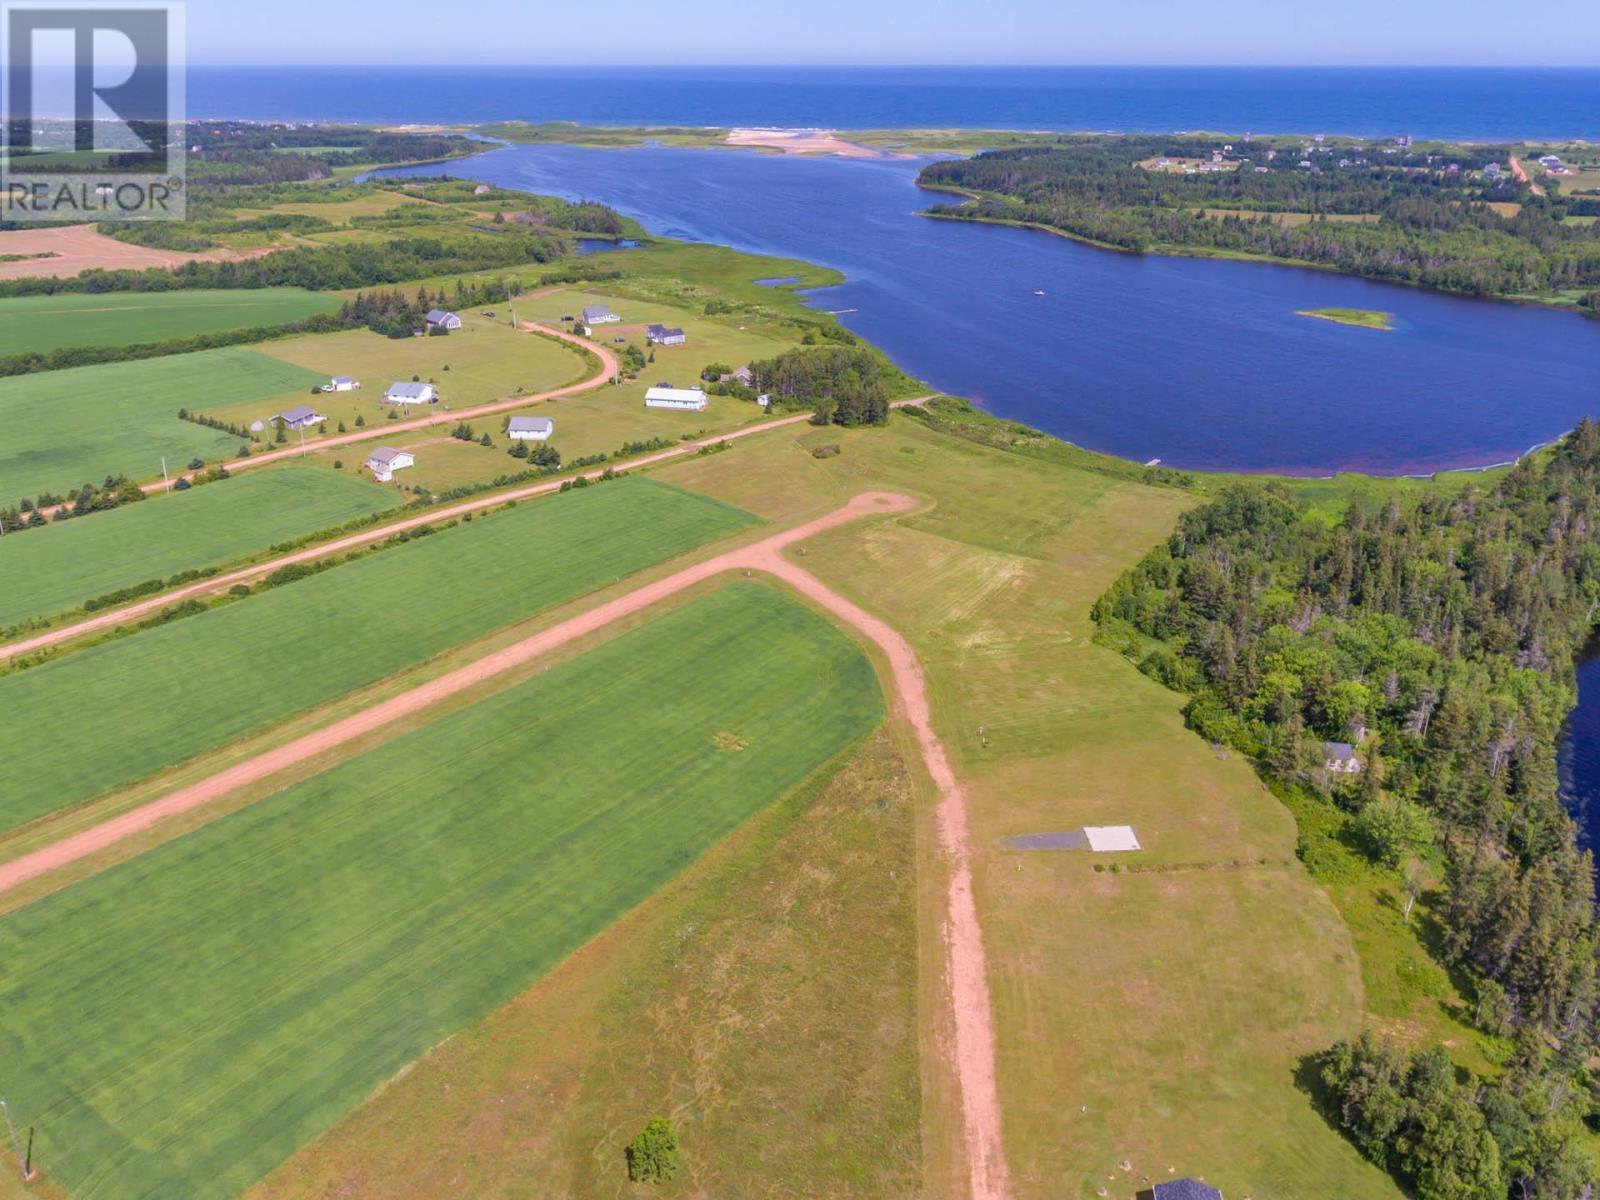 Lot 2 Majestic View Lane, Lakeside, Prince Edward Island  C0A 1S0 - Photo 4 - 202118512